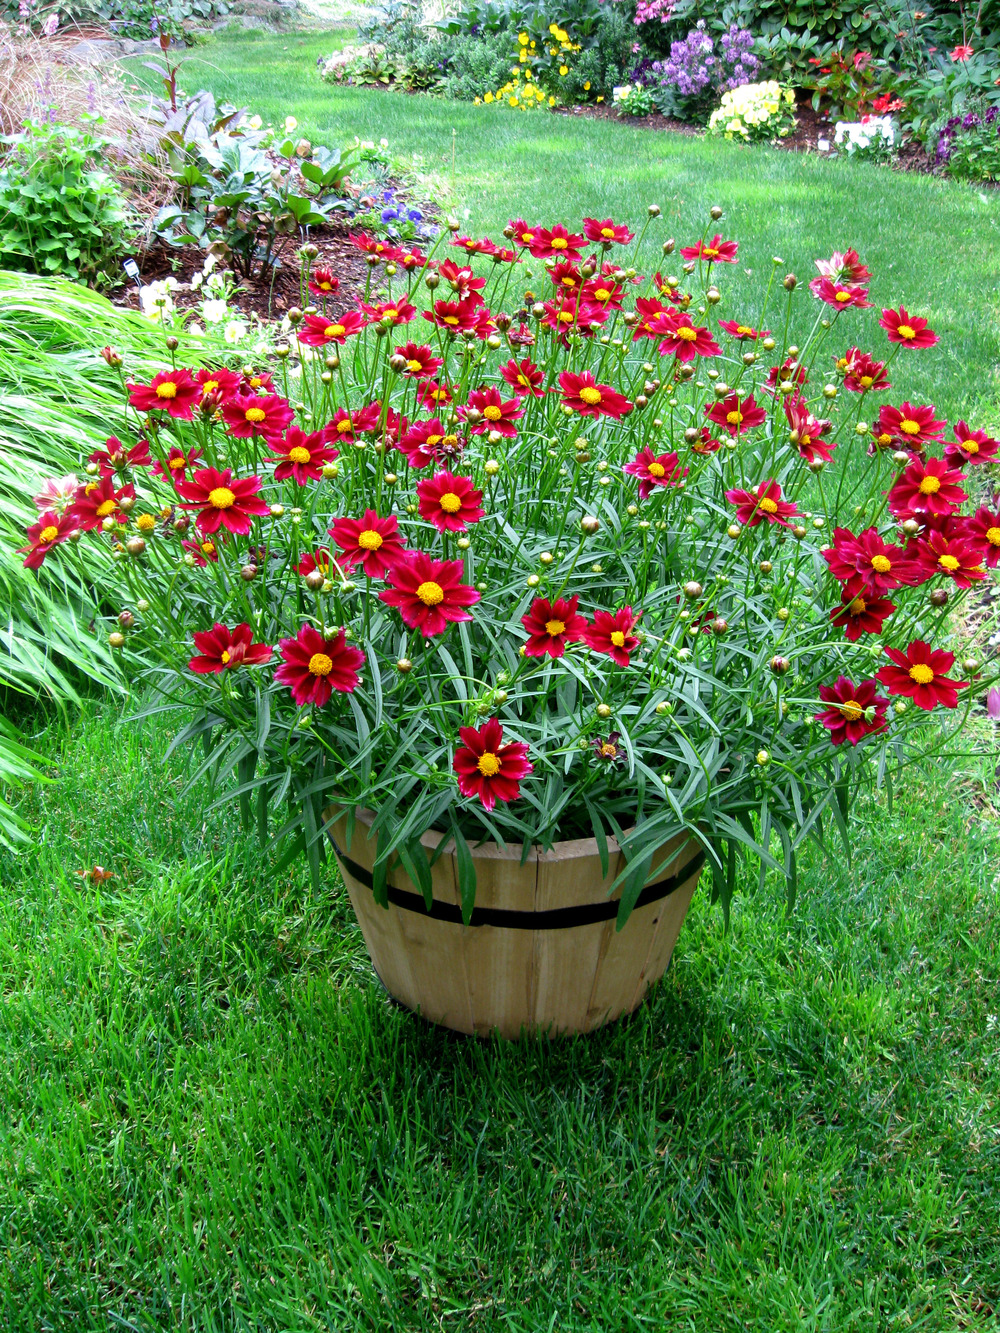 http://cubits.org/pics/2013-04-08/LarryR/417e67.jpg